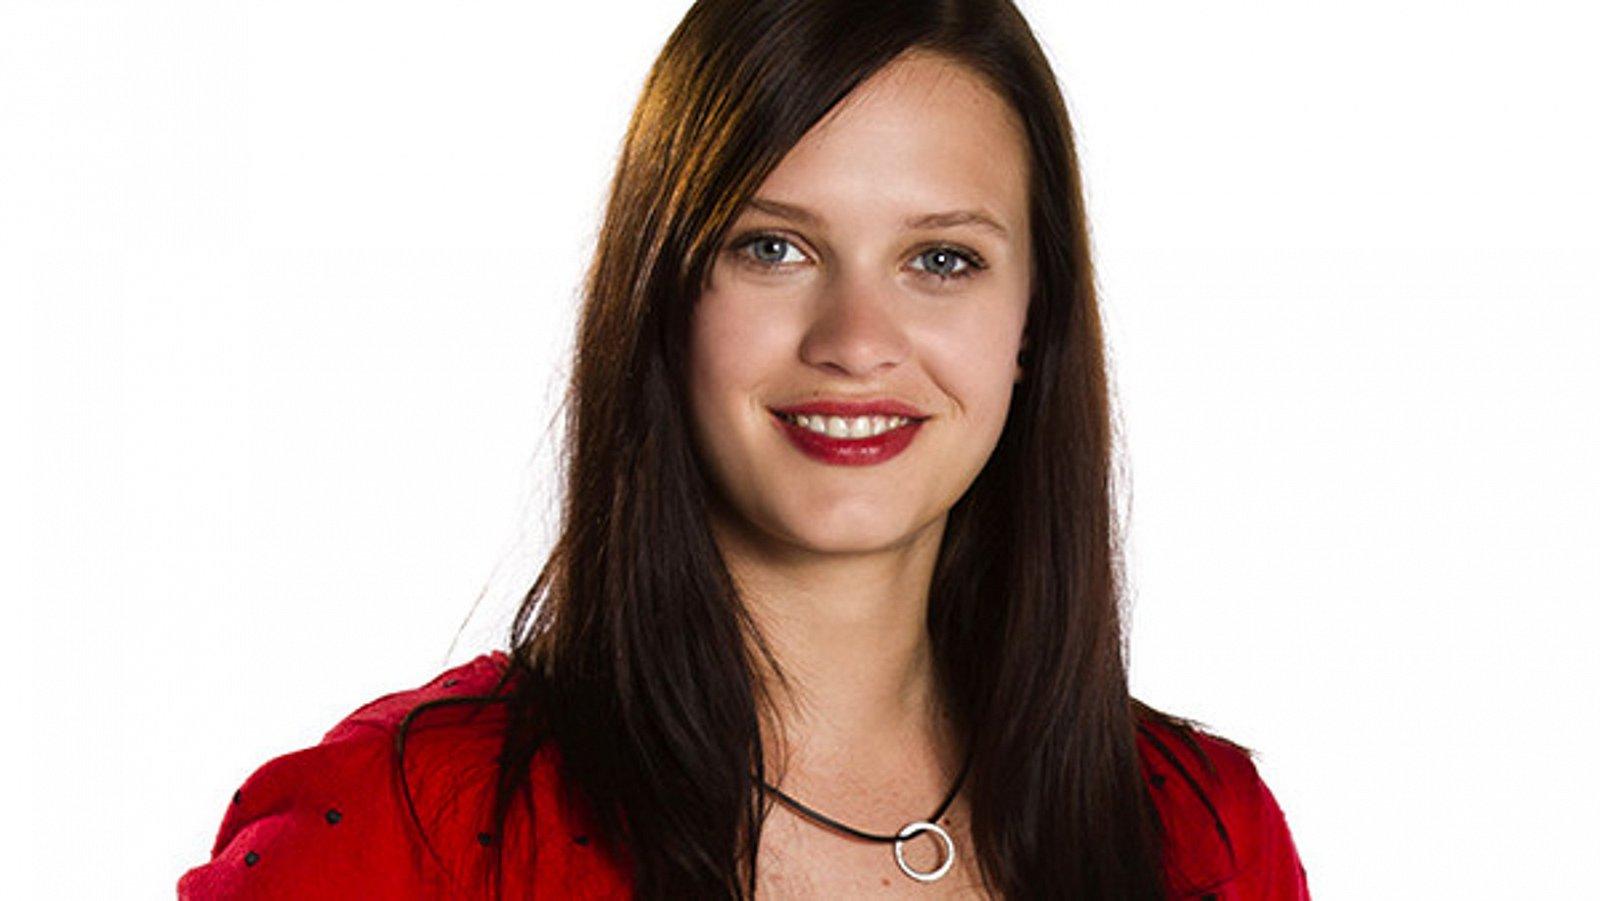 Forum on this topic: Wendy Moniz, kristyna-leichtova/